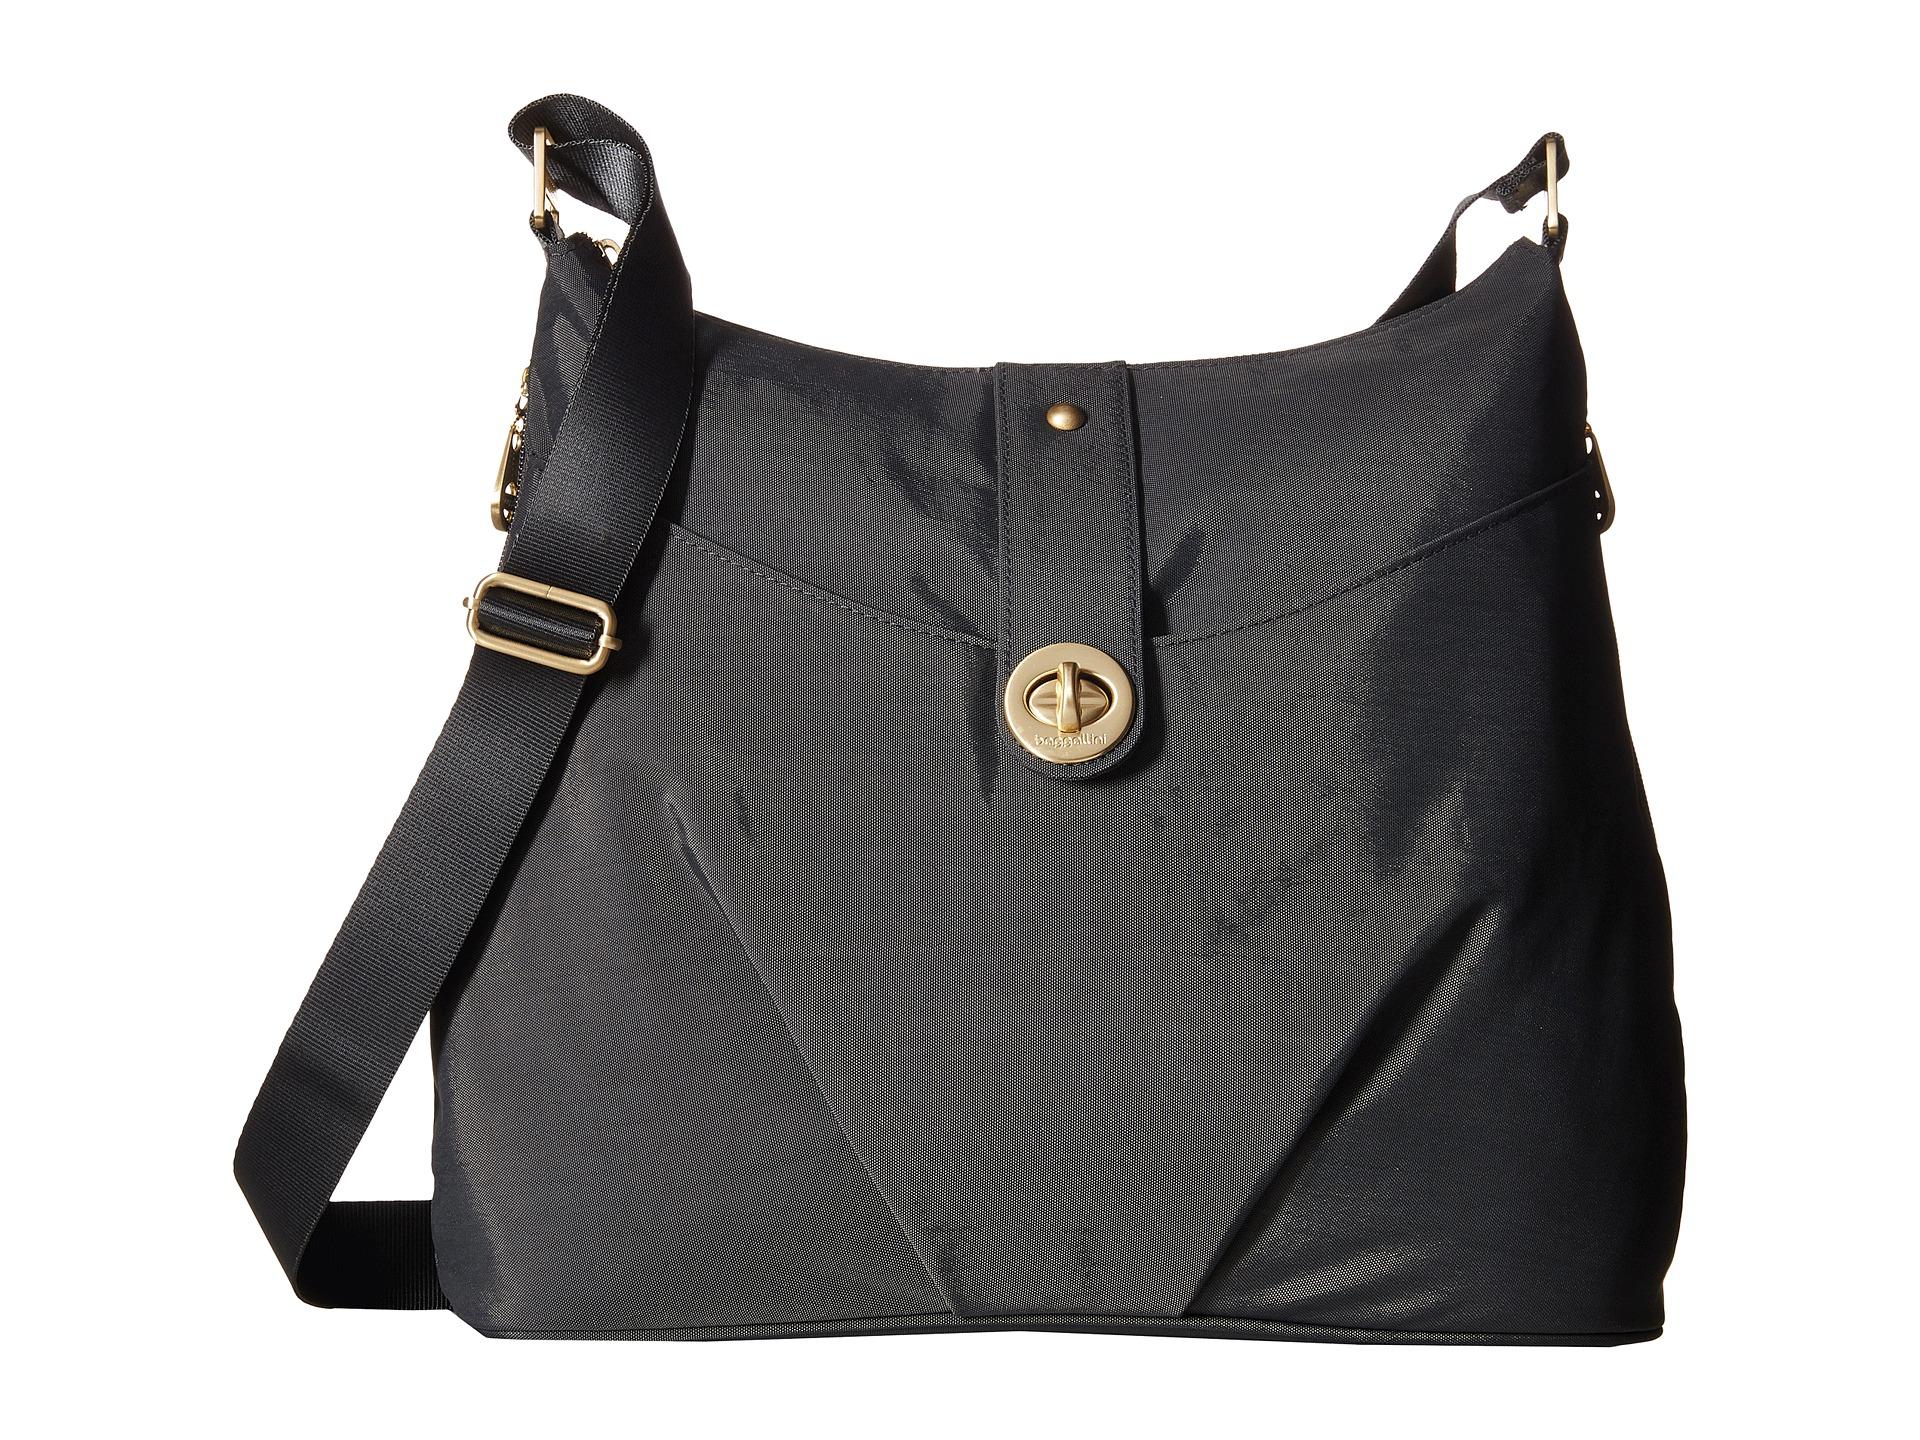 baggallini gold helsinki bag at zappos